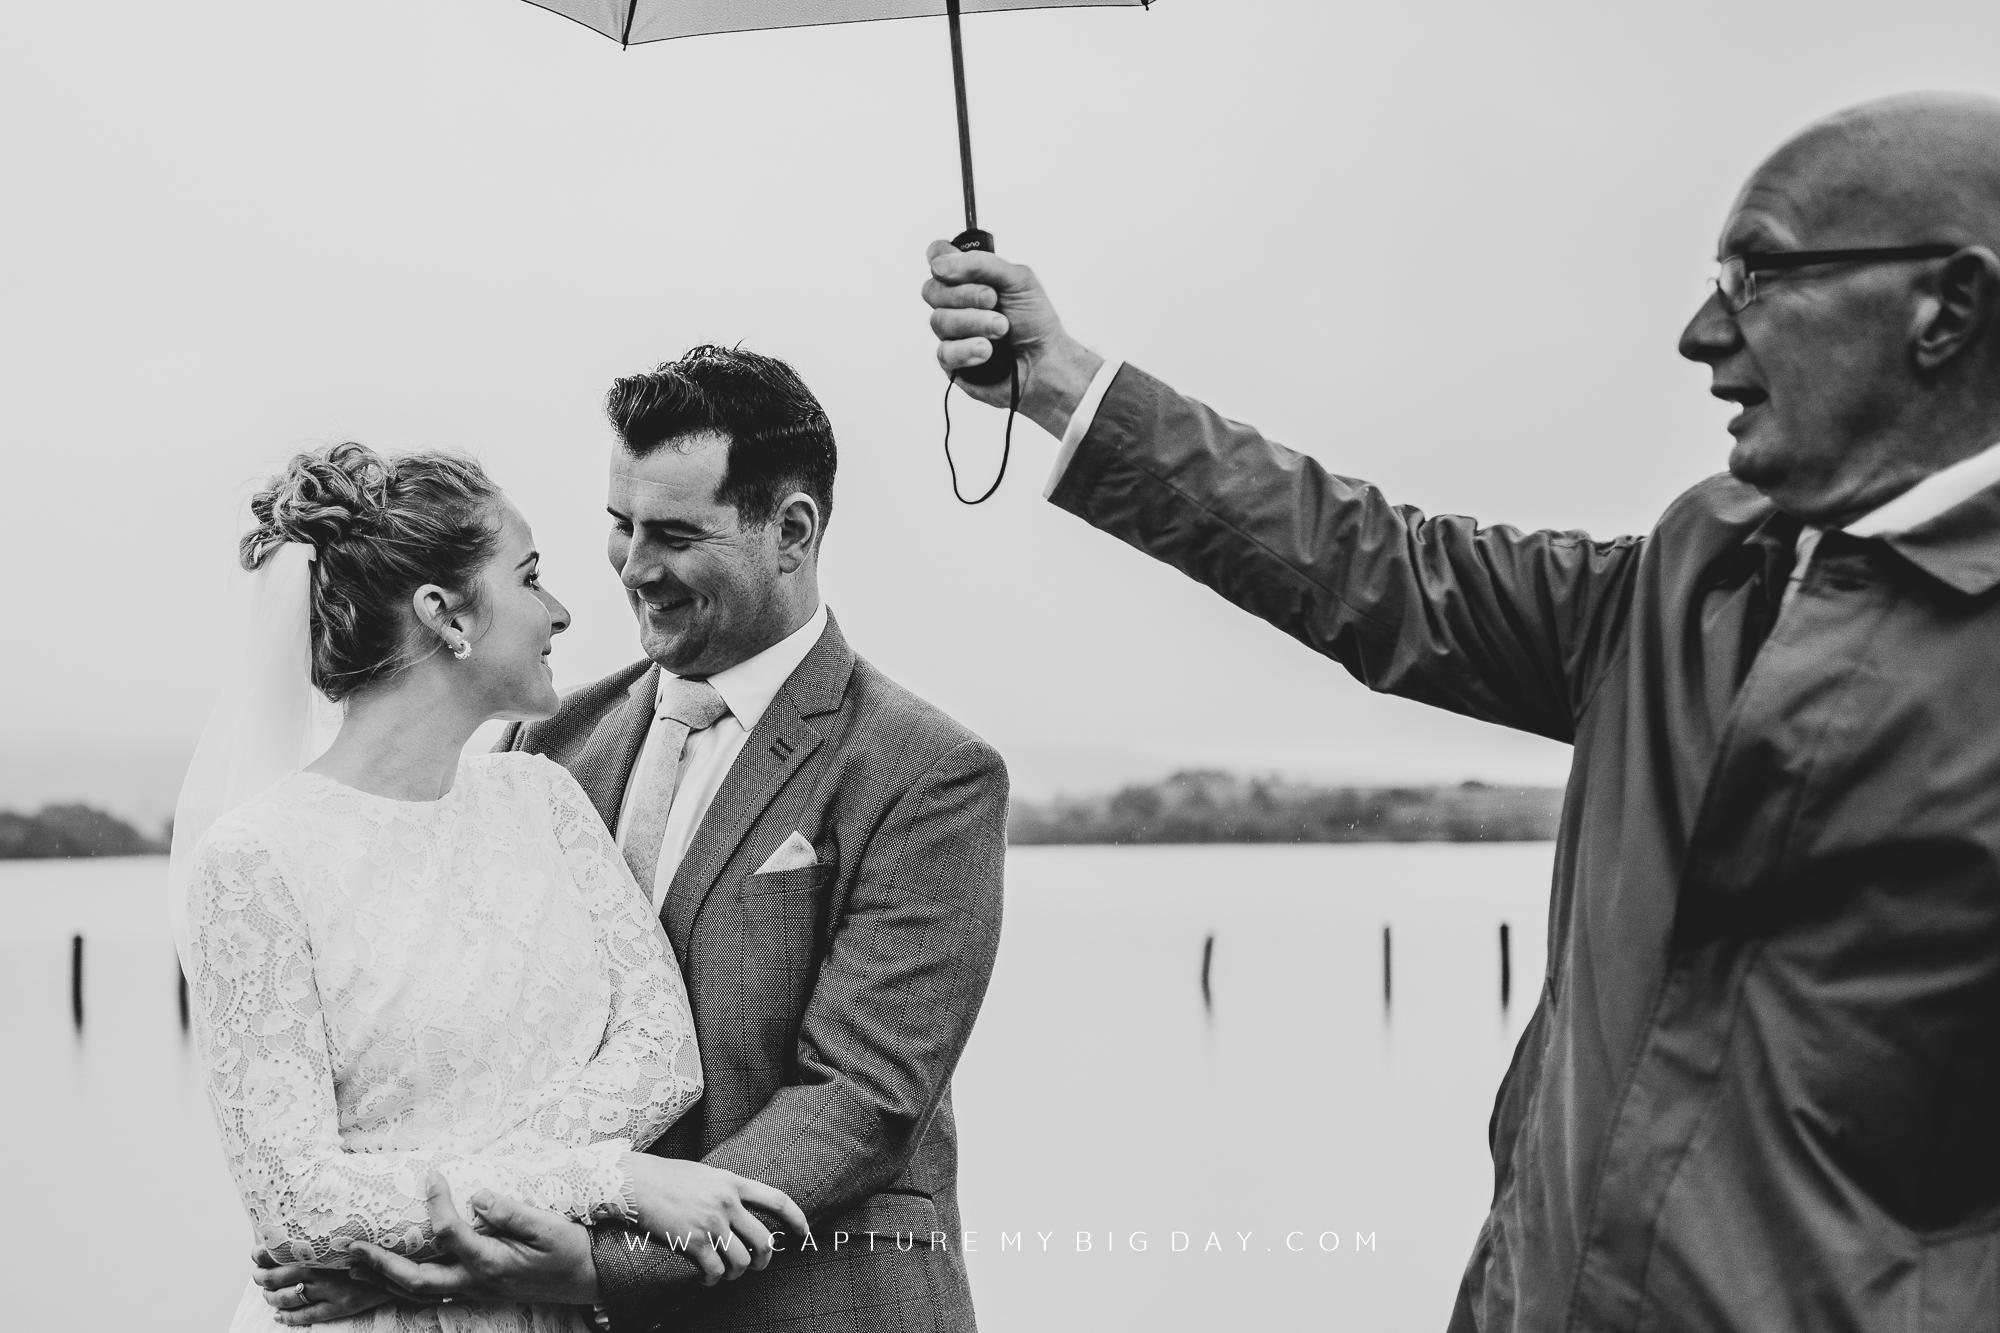 Father holding umbrella over the bride